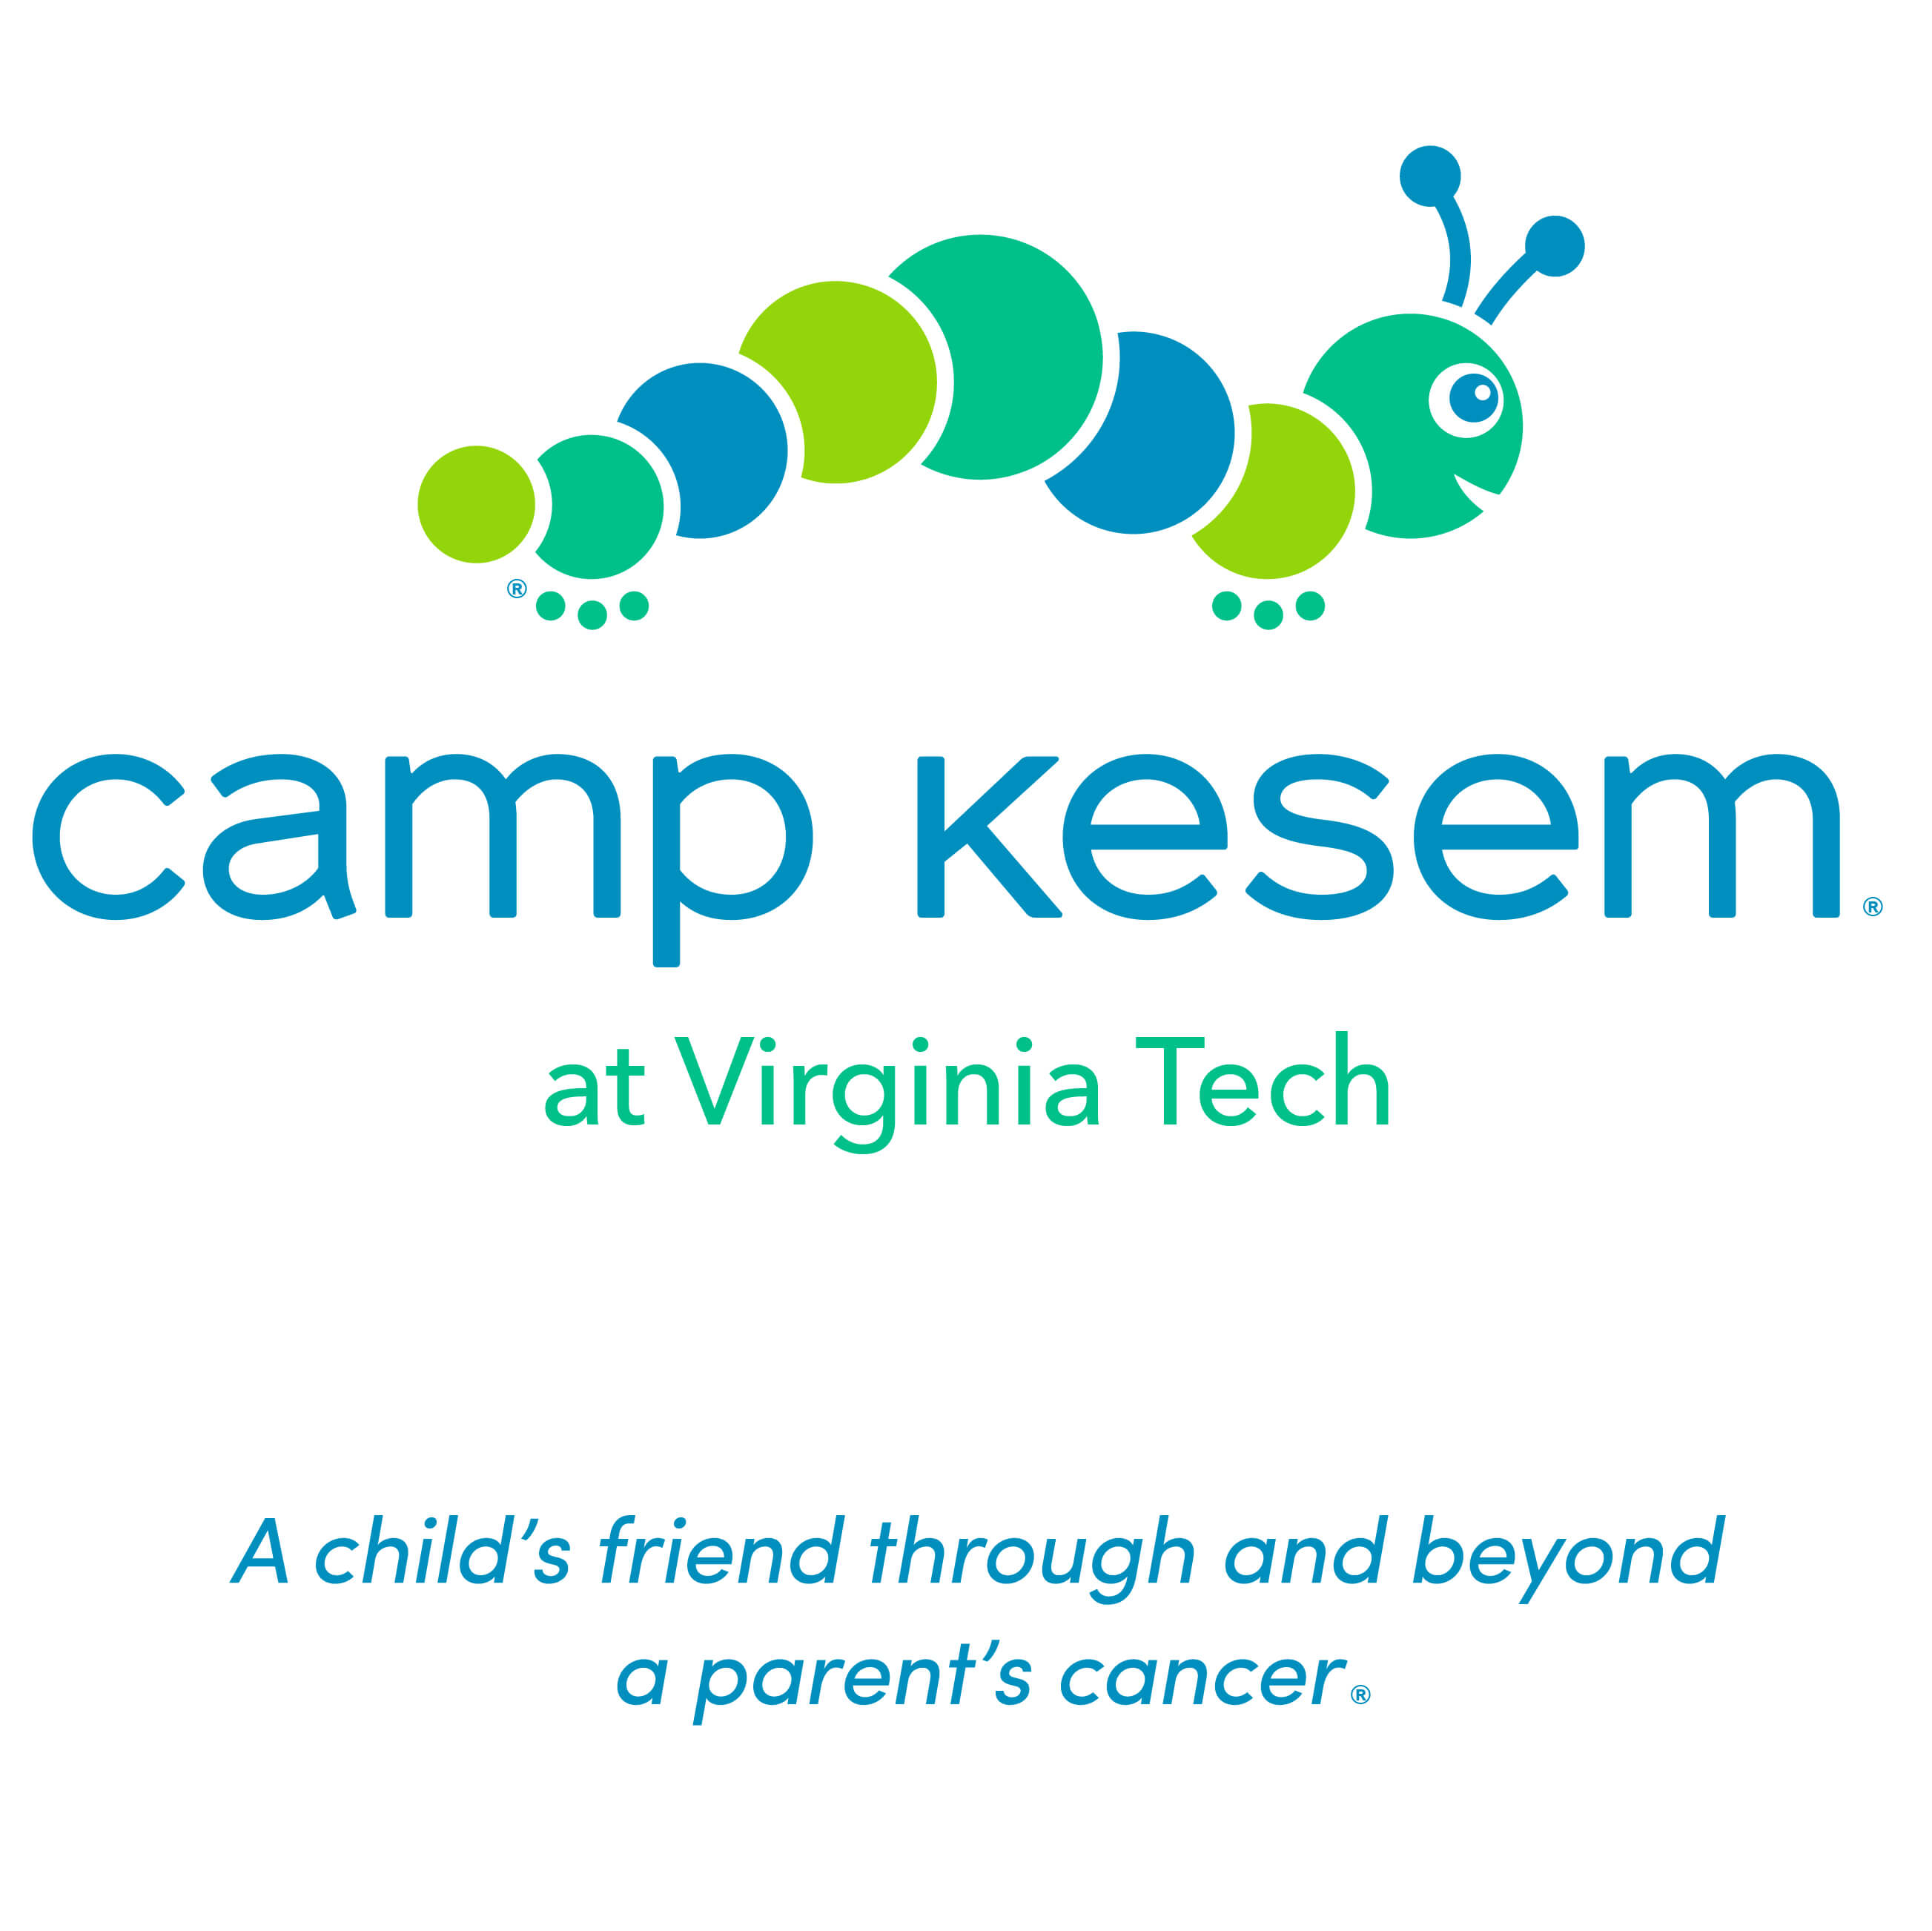 Camp Kesem at Virginia Tech